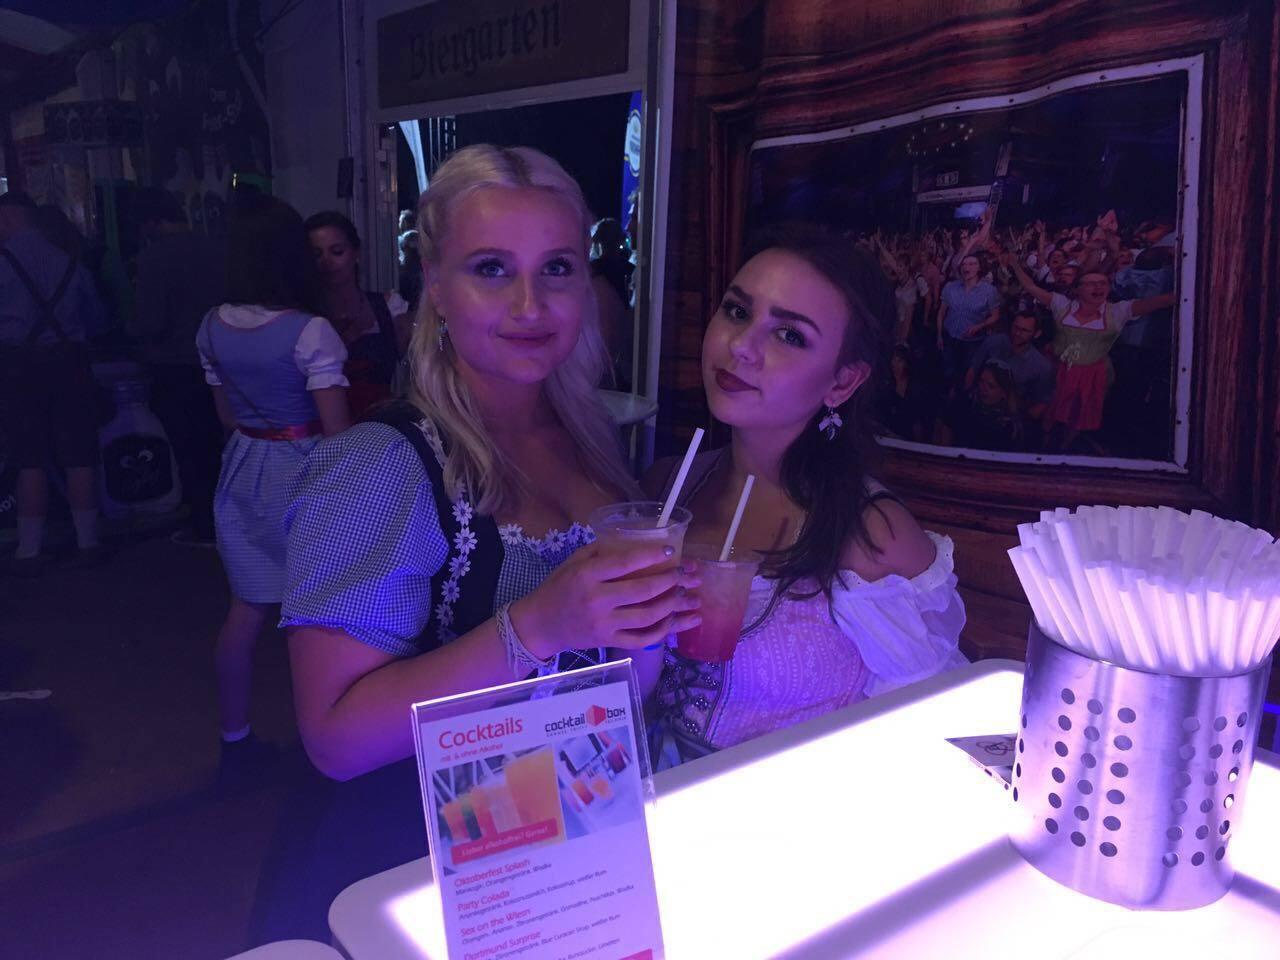 Oktober_Fest_Dortmund_2017_cocktail-box_1_